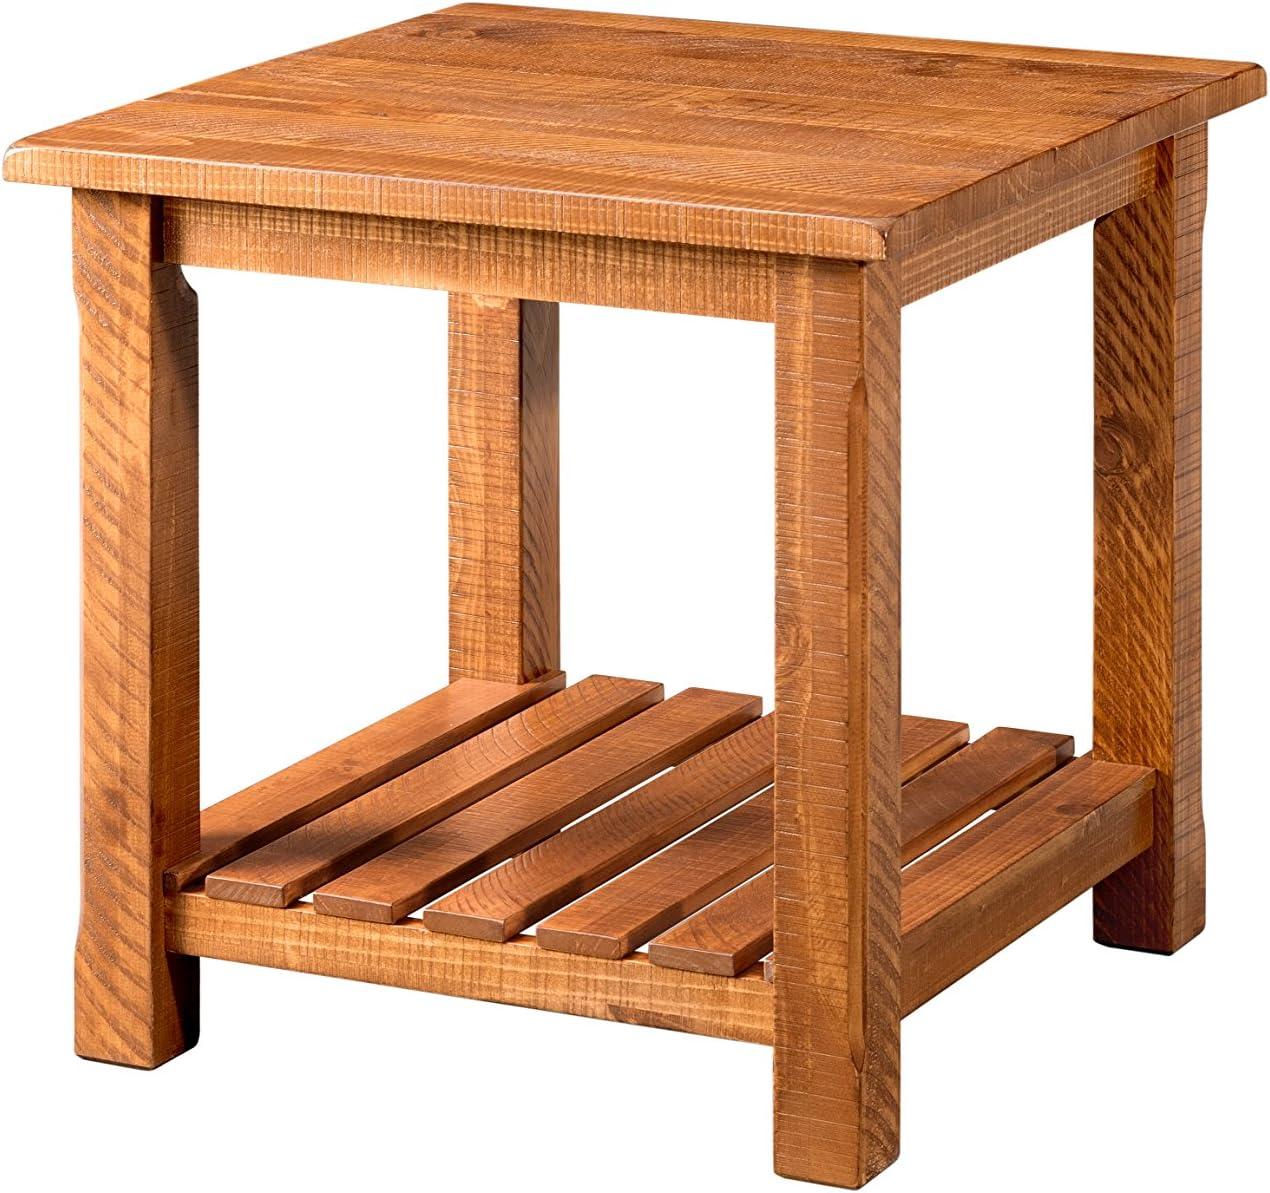 Martin Svensson Home End Table, Honey Tobacco